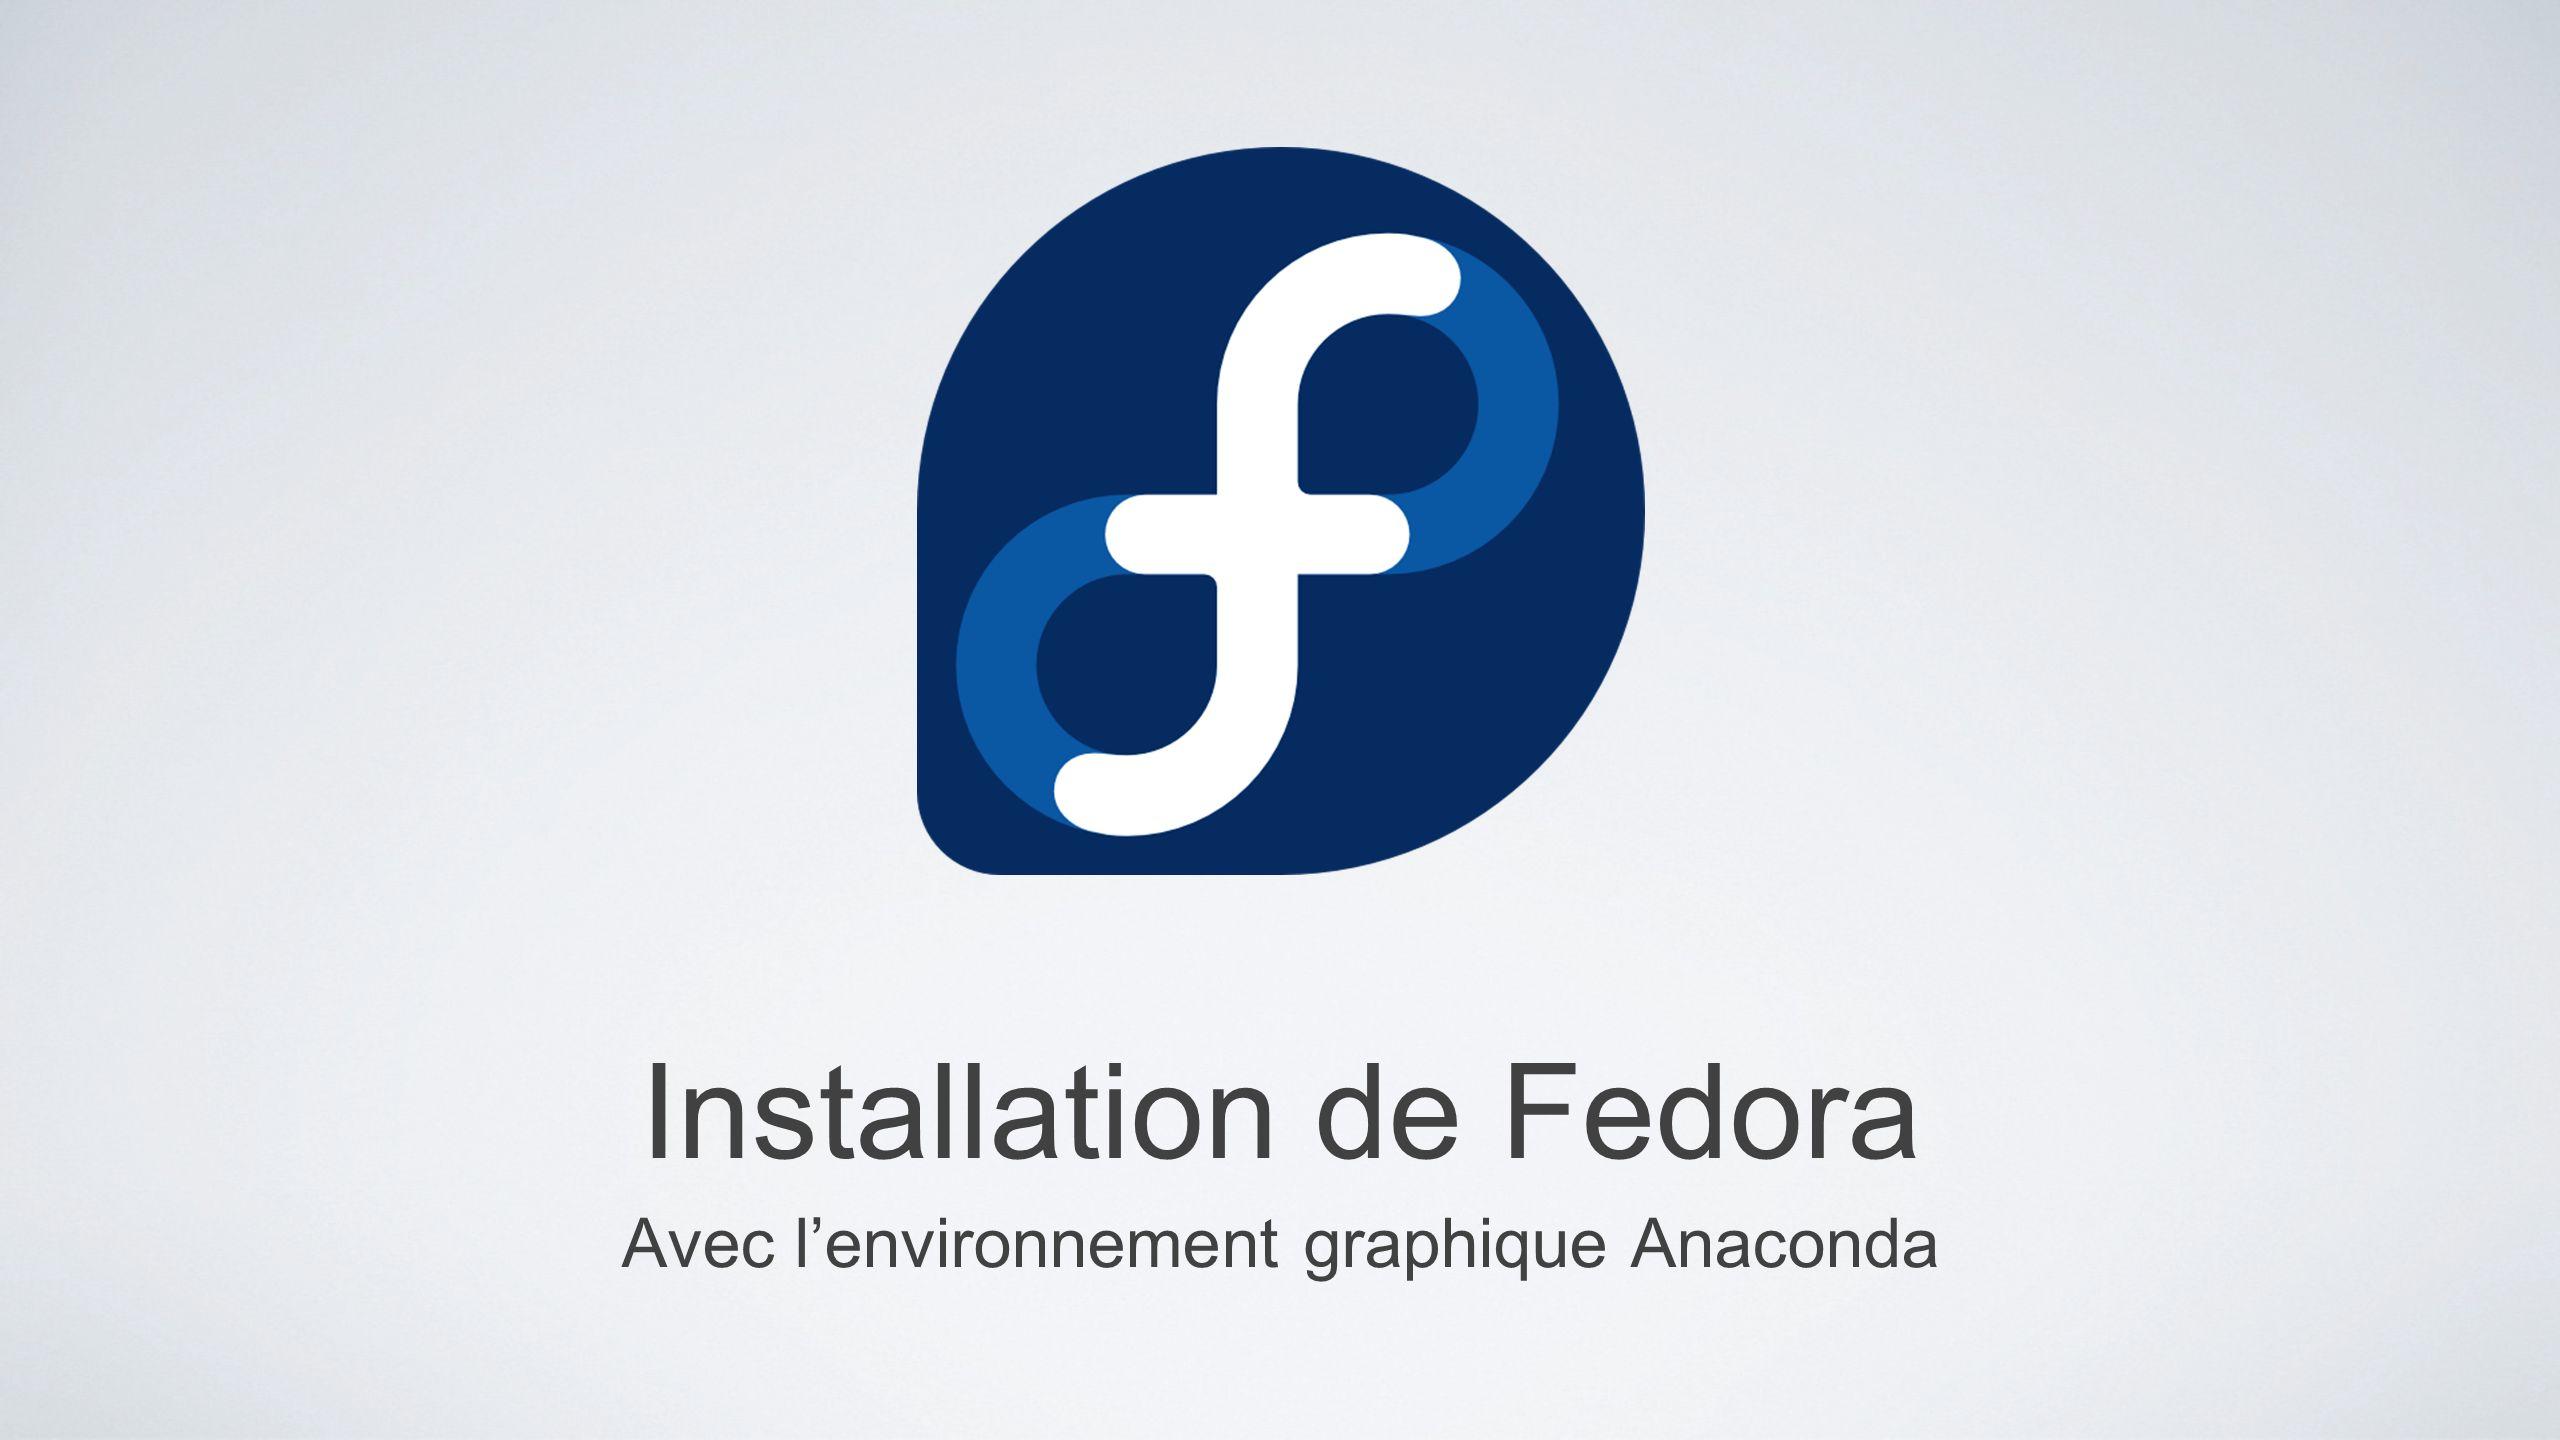 Installation de Fedora Avec lenvironnement graphique Anaconda